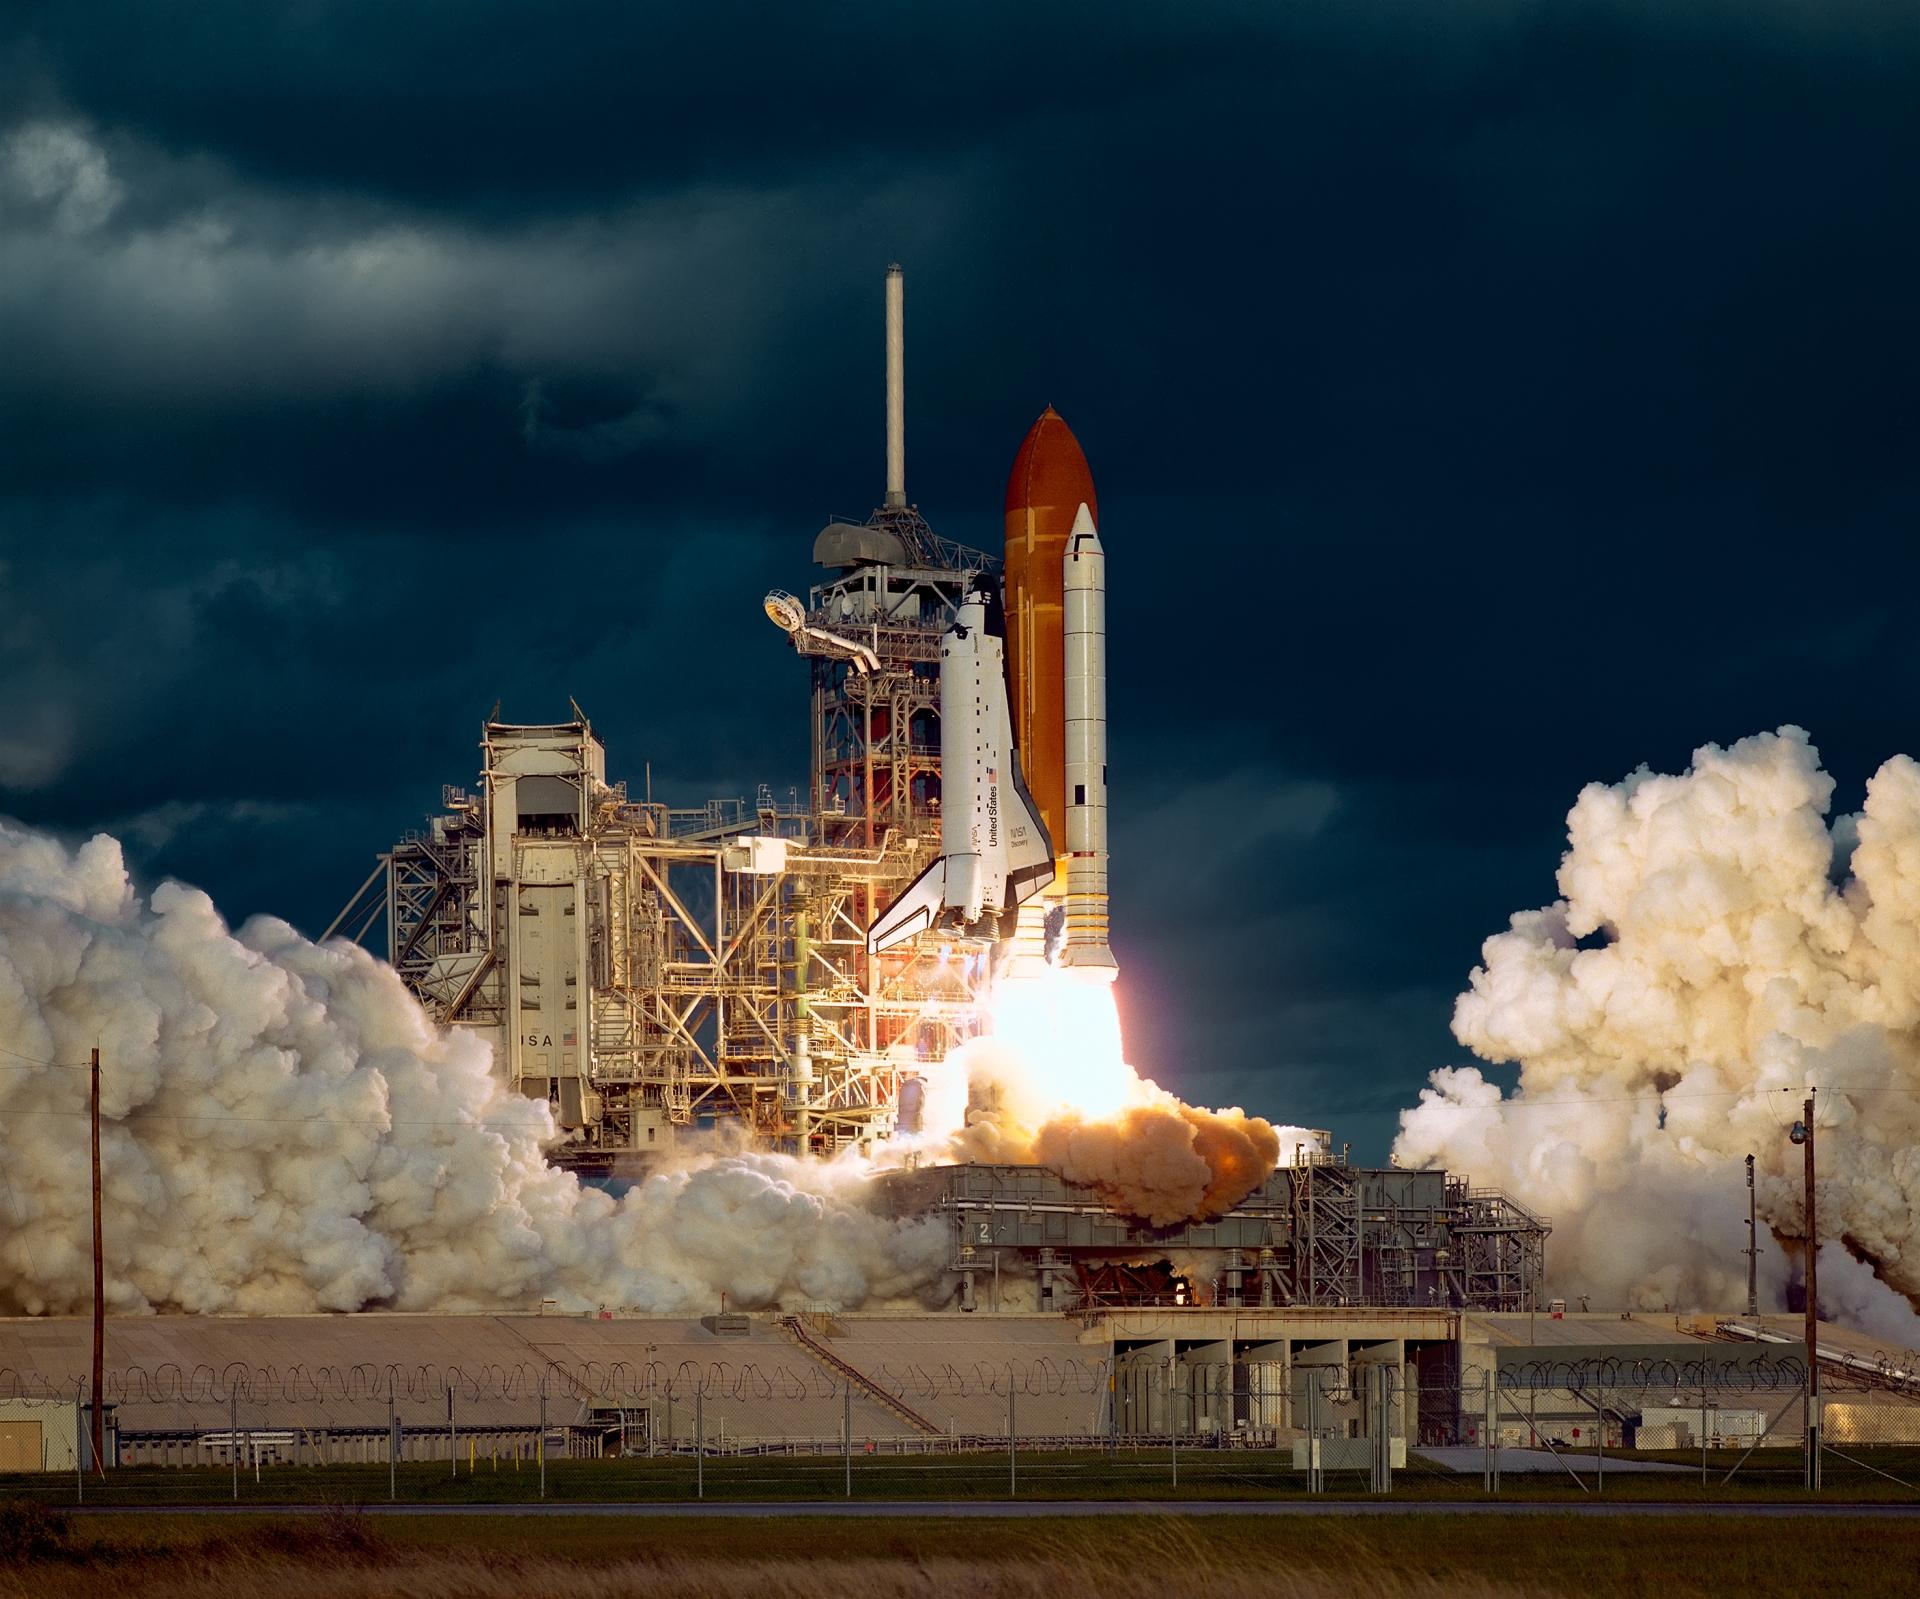 space shuttle program nasa - photo #23